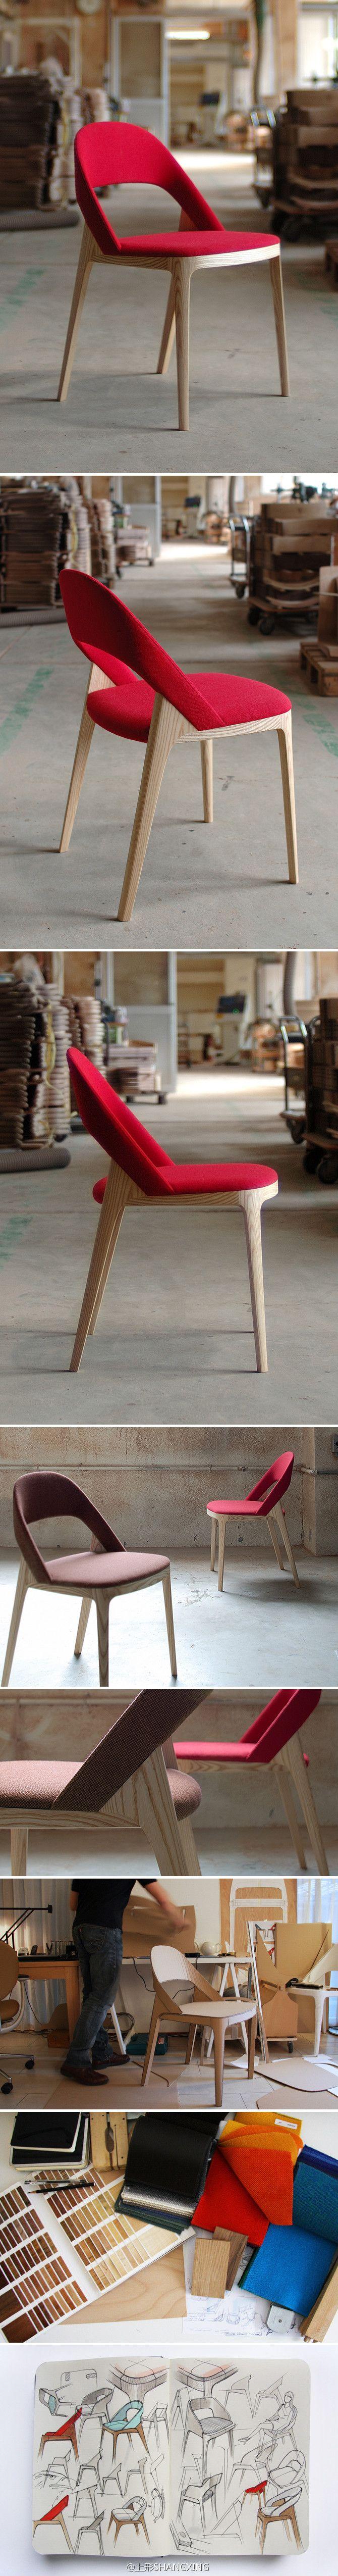 261 best Furniture images on Pinterest